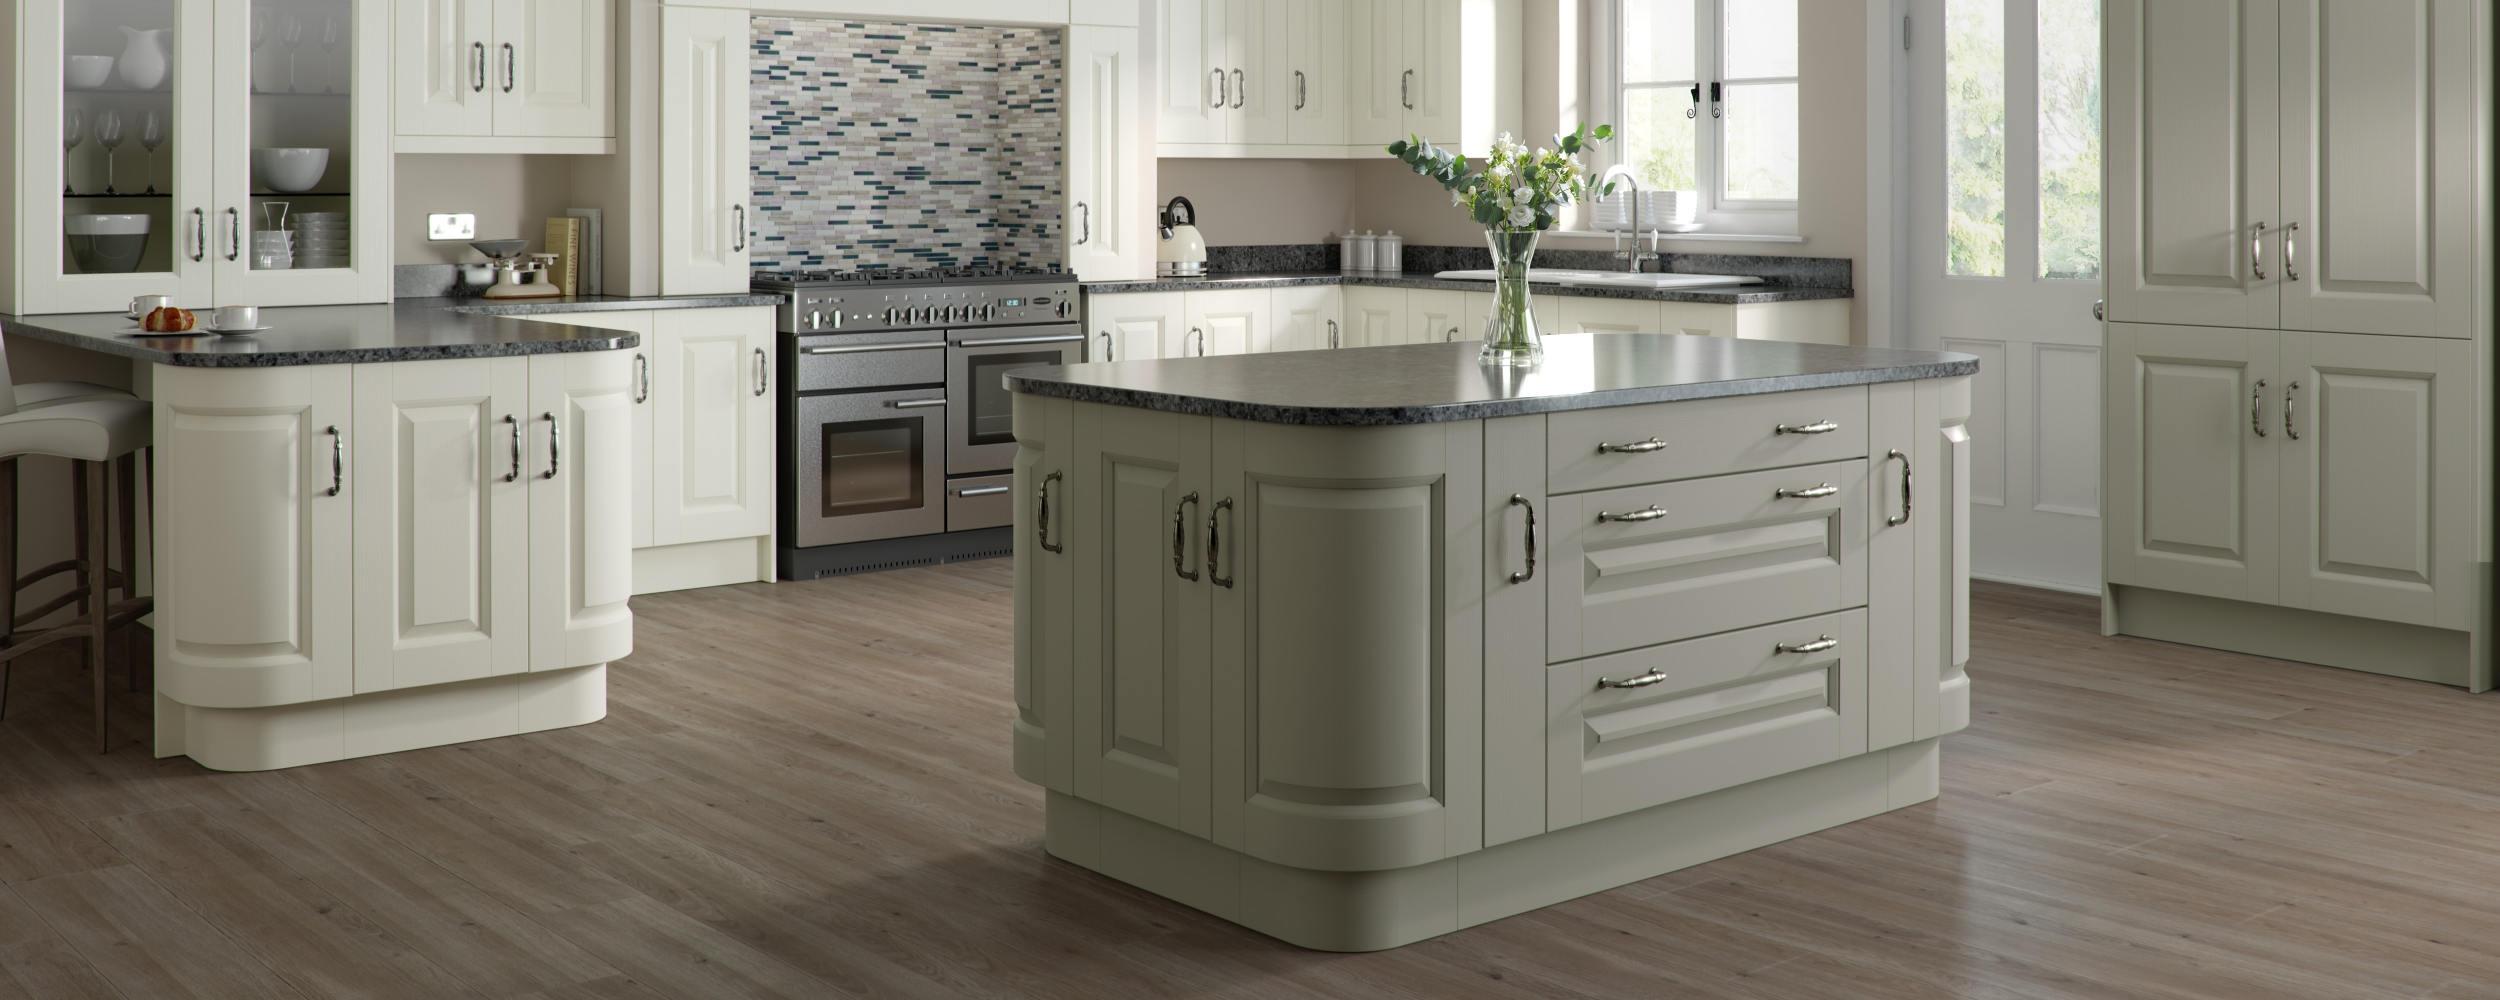 traditional-kitchen-edinburgh